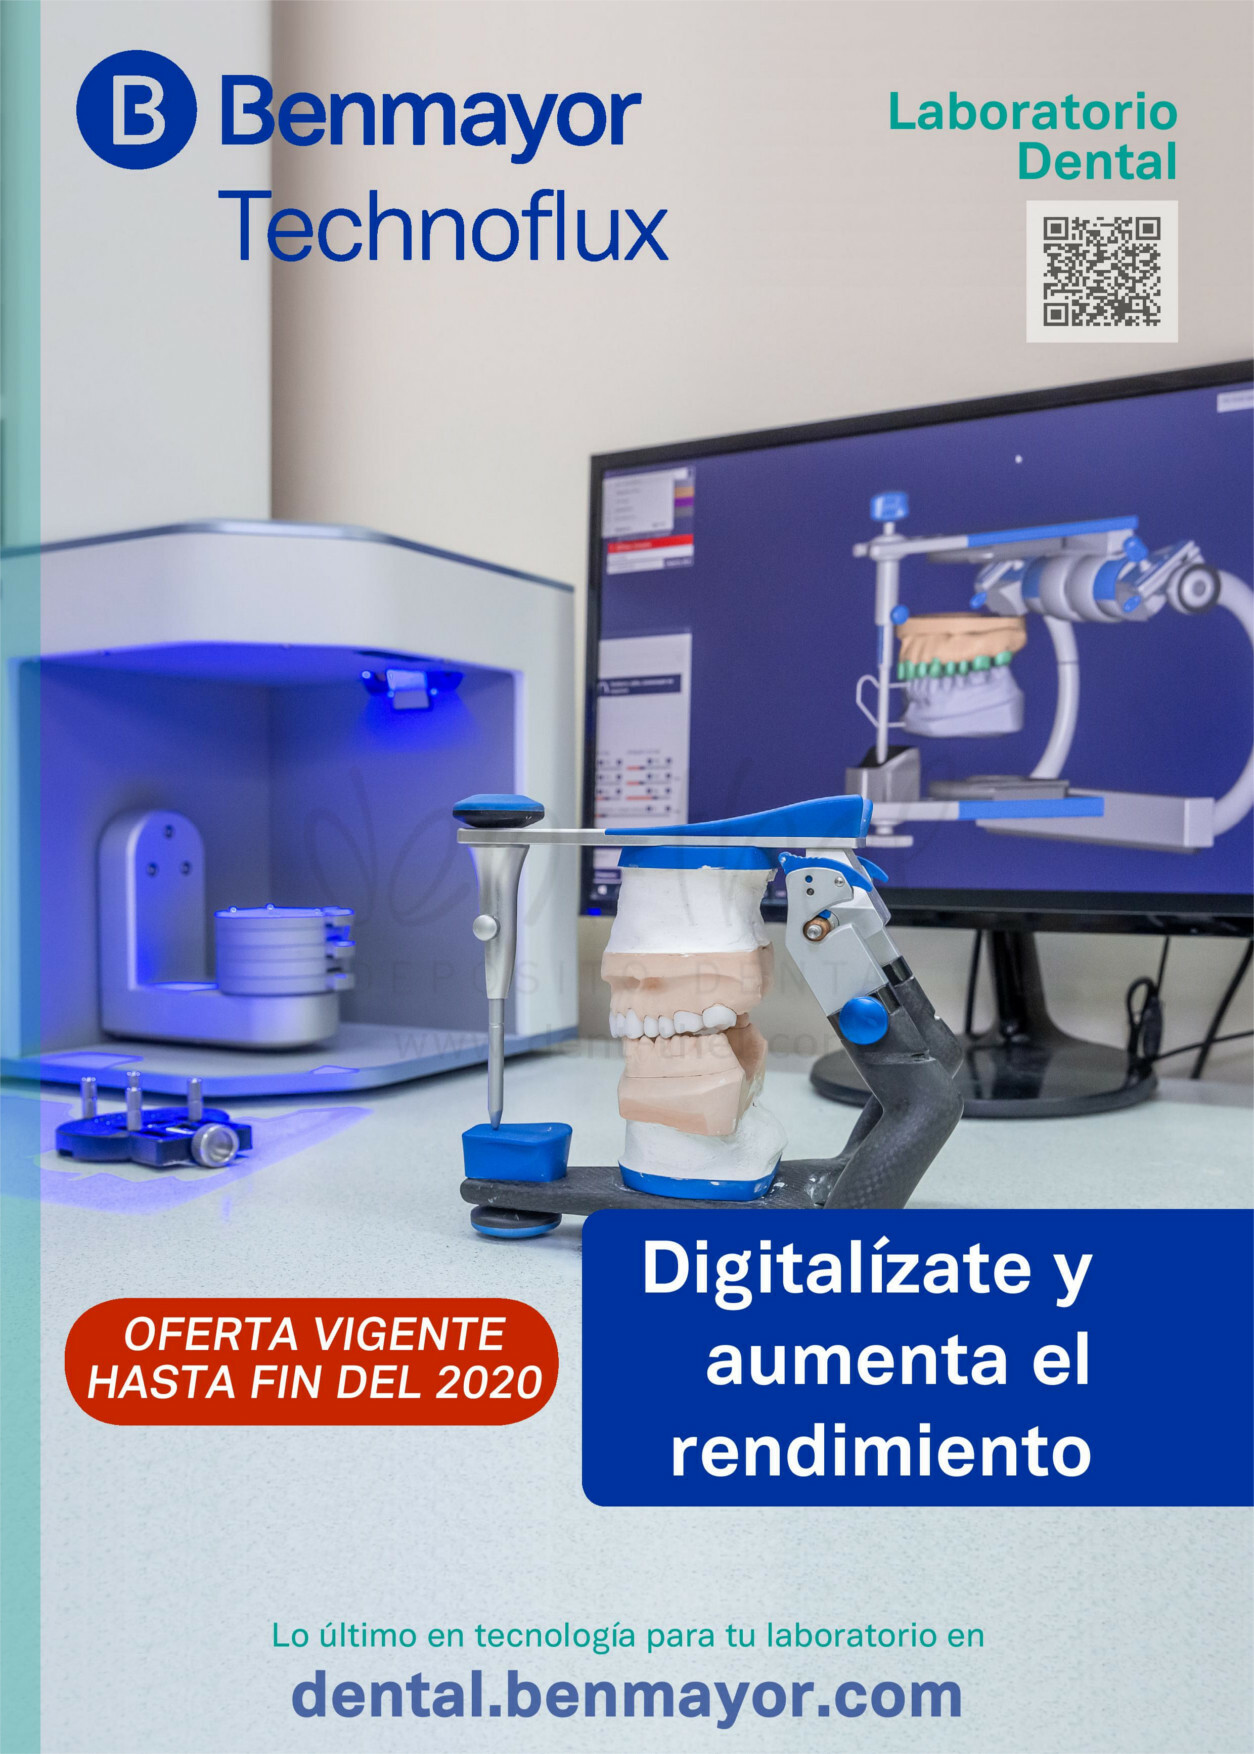 Ofertas Benmayor laboratorio hasta 31/12/2020